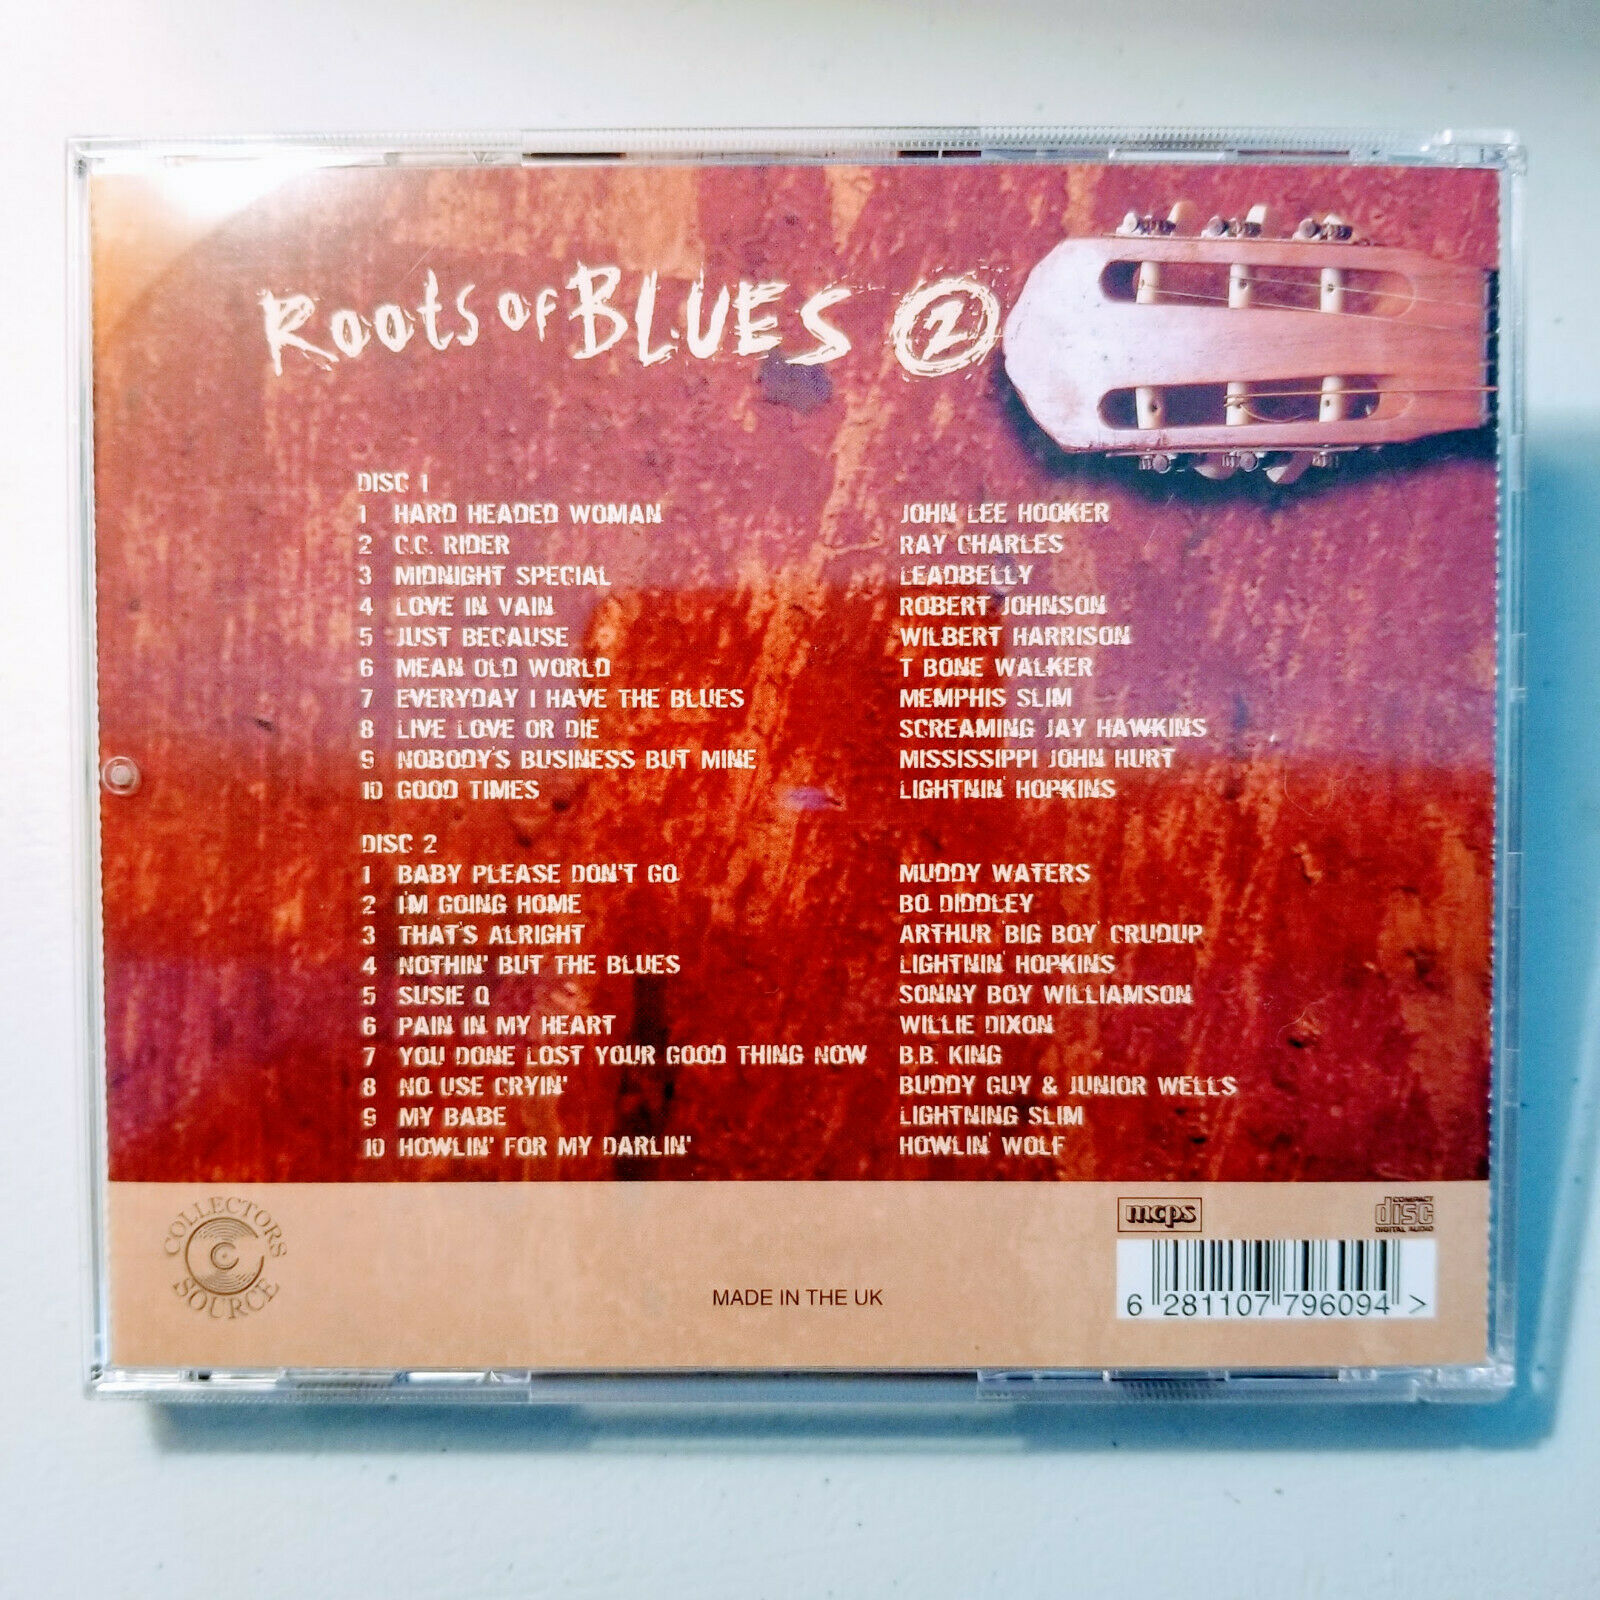 roots-of-blues-2-b-side.jpg